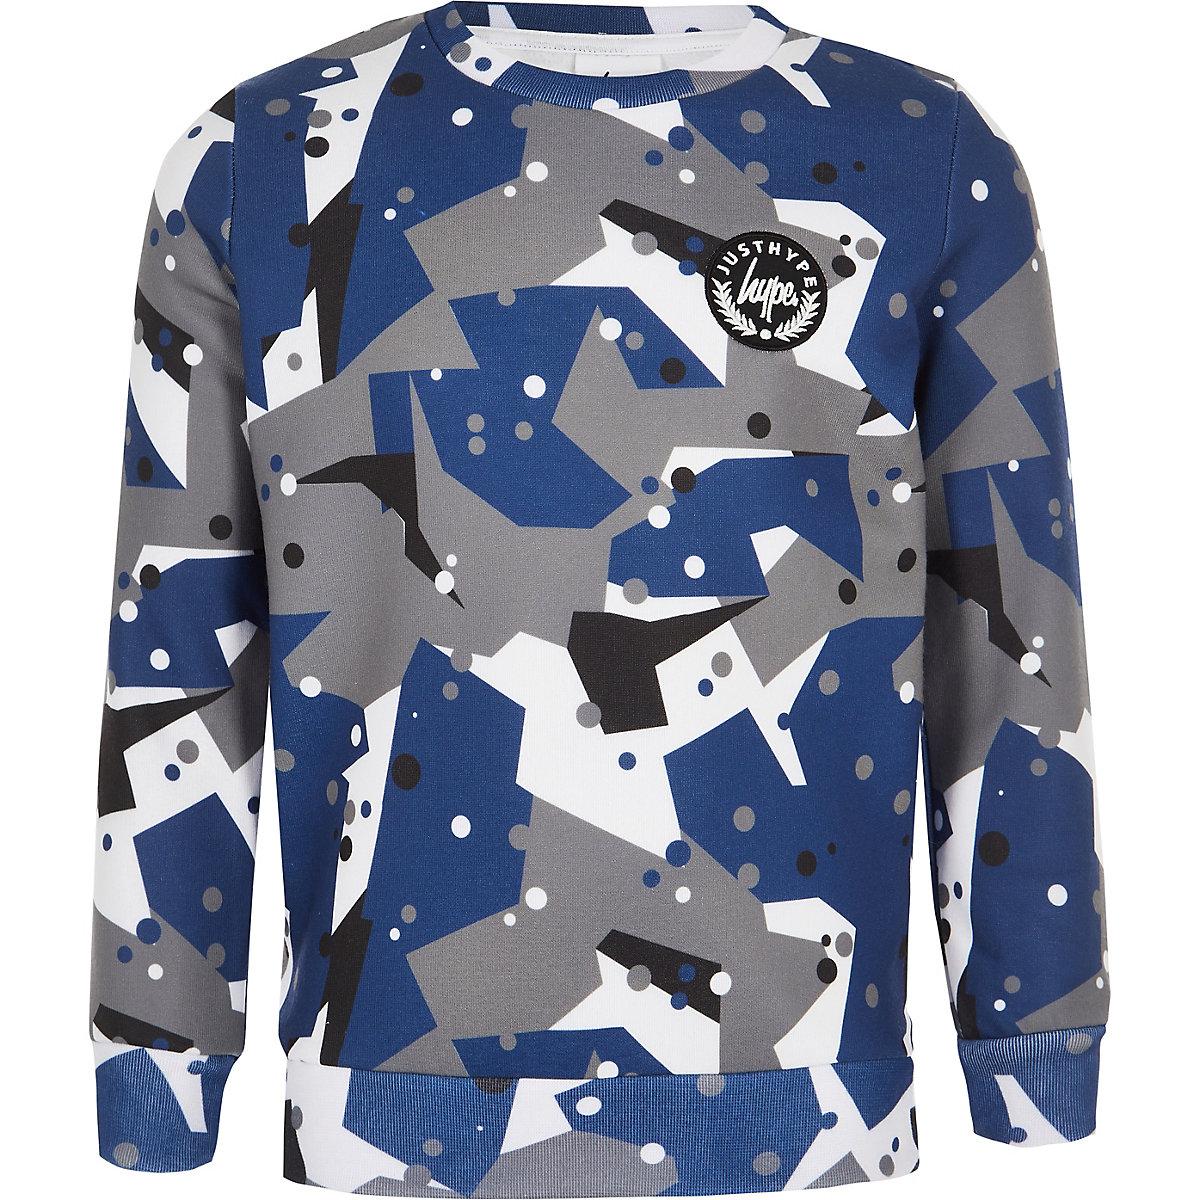 Boys Hype grey camo sweatshirt